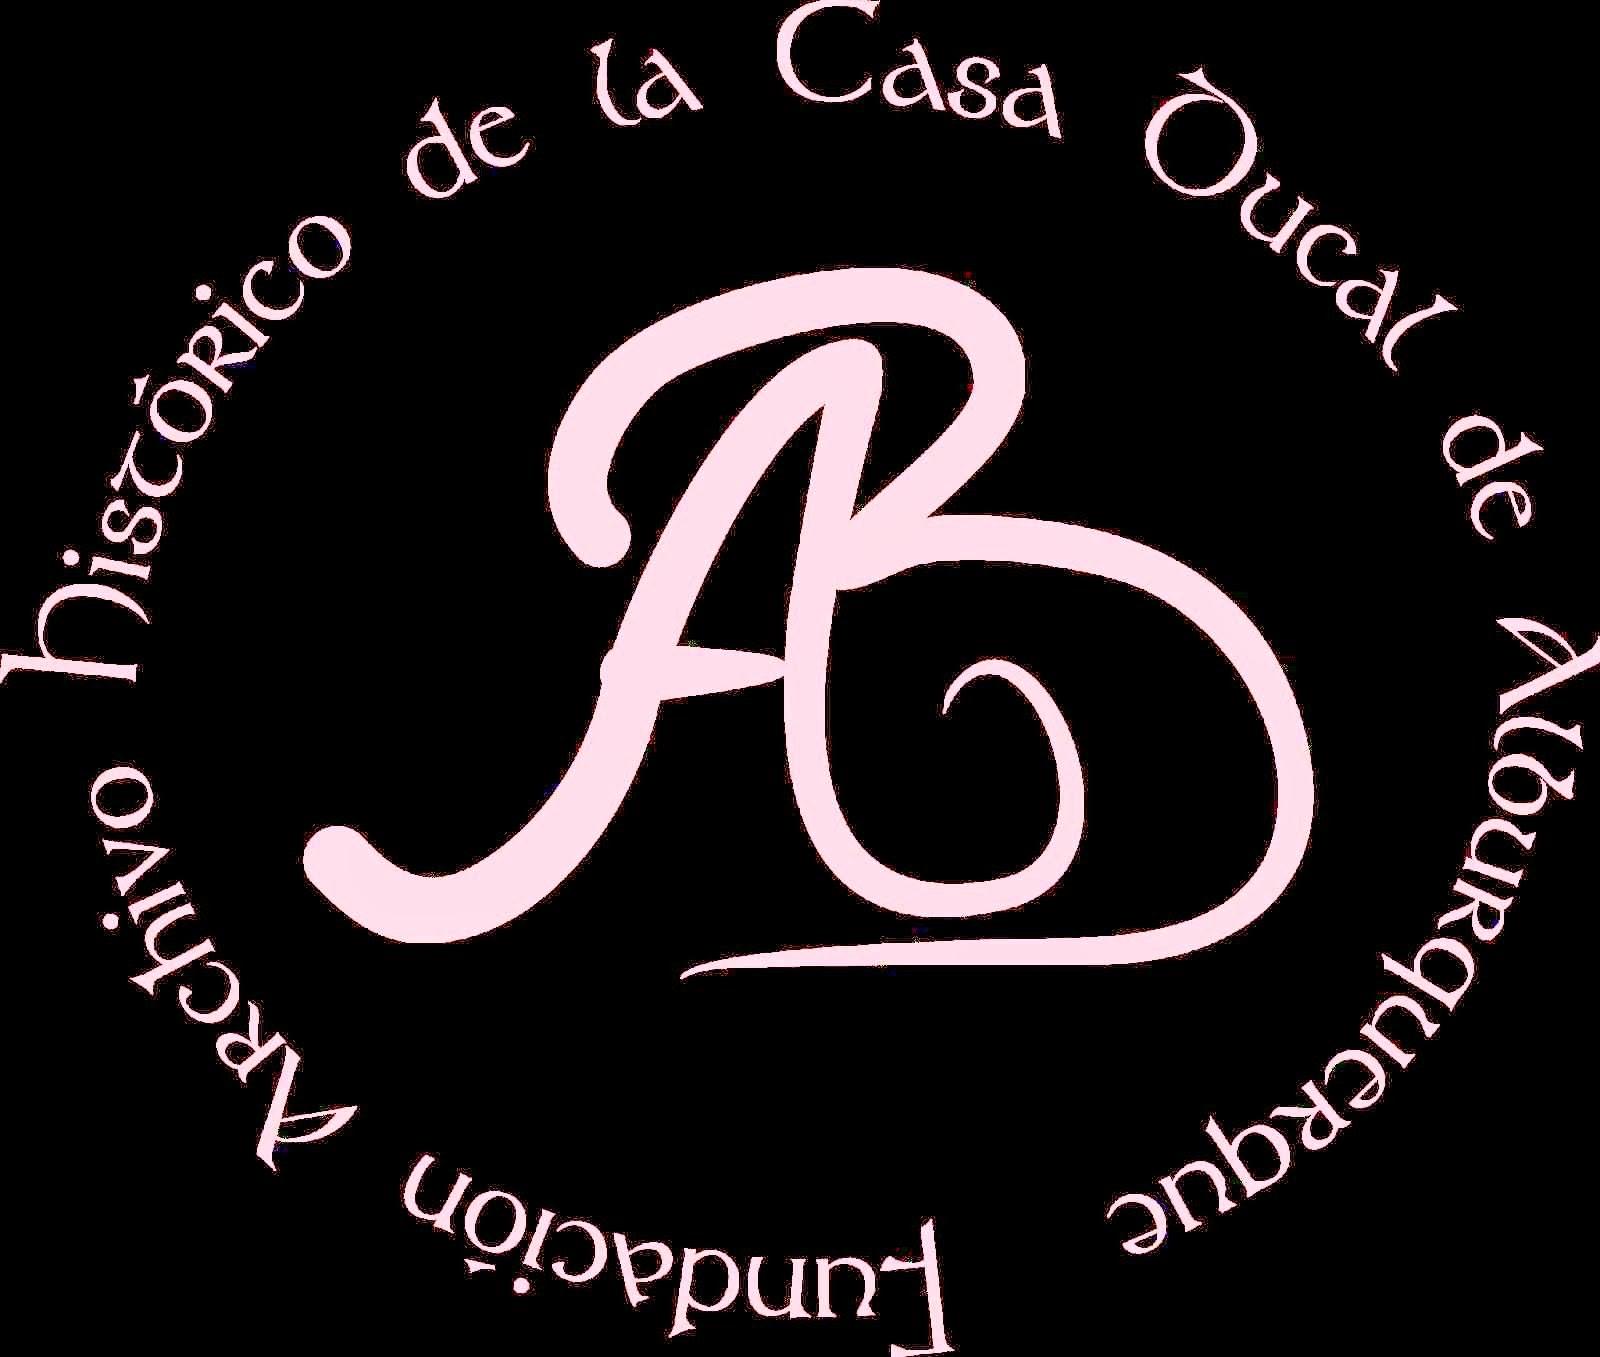 Archivo Ducal de la Casa de Alburquerque: